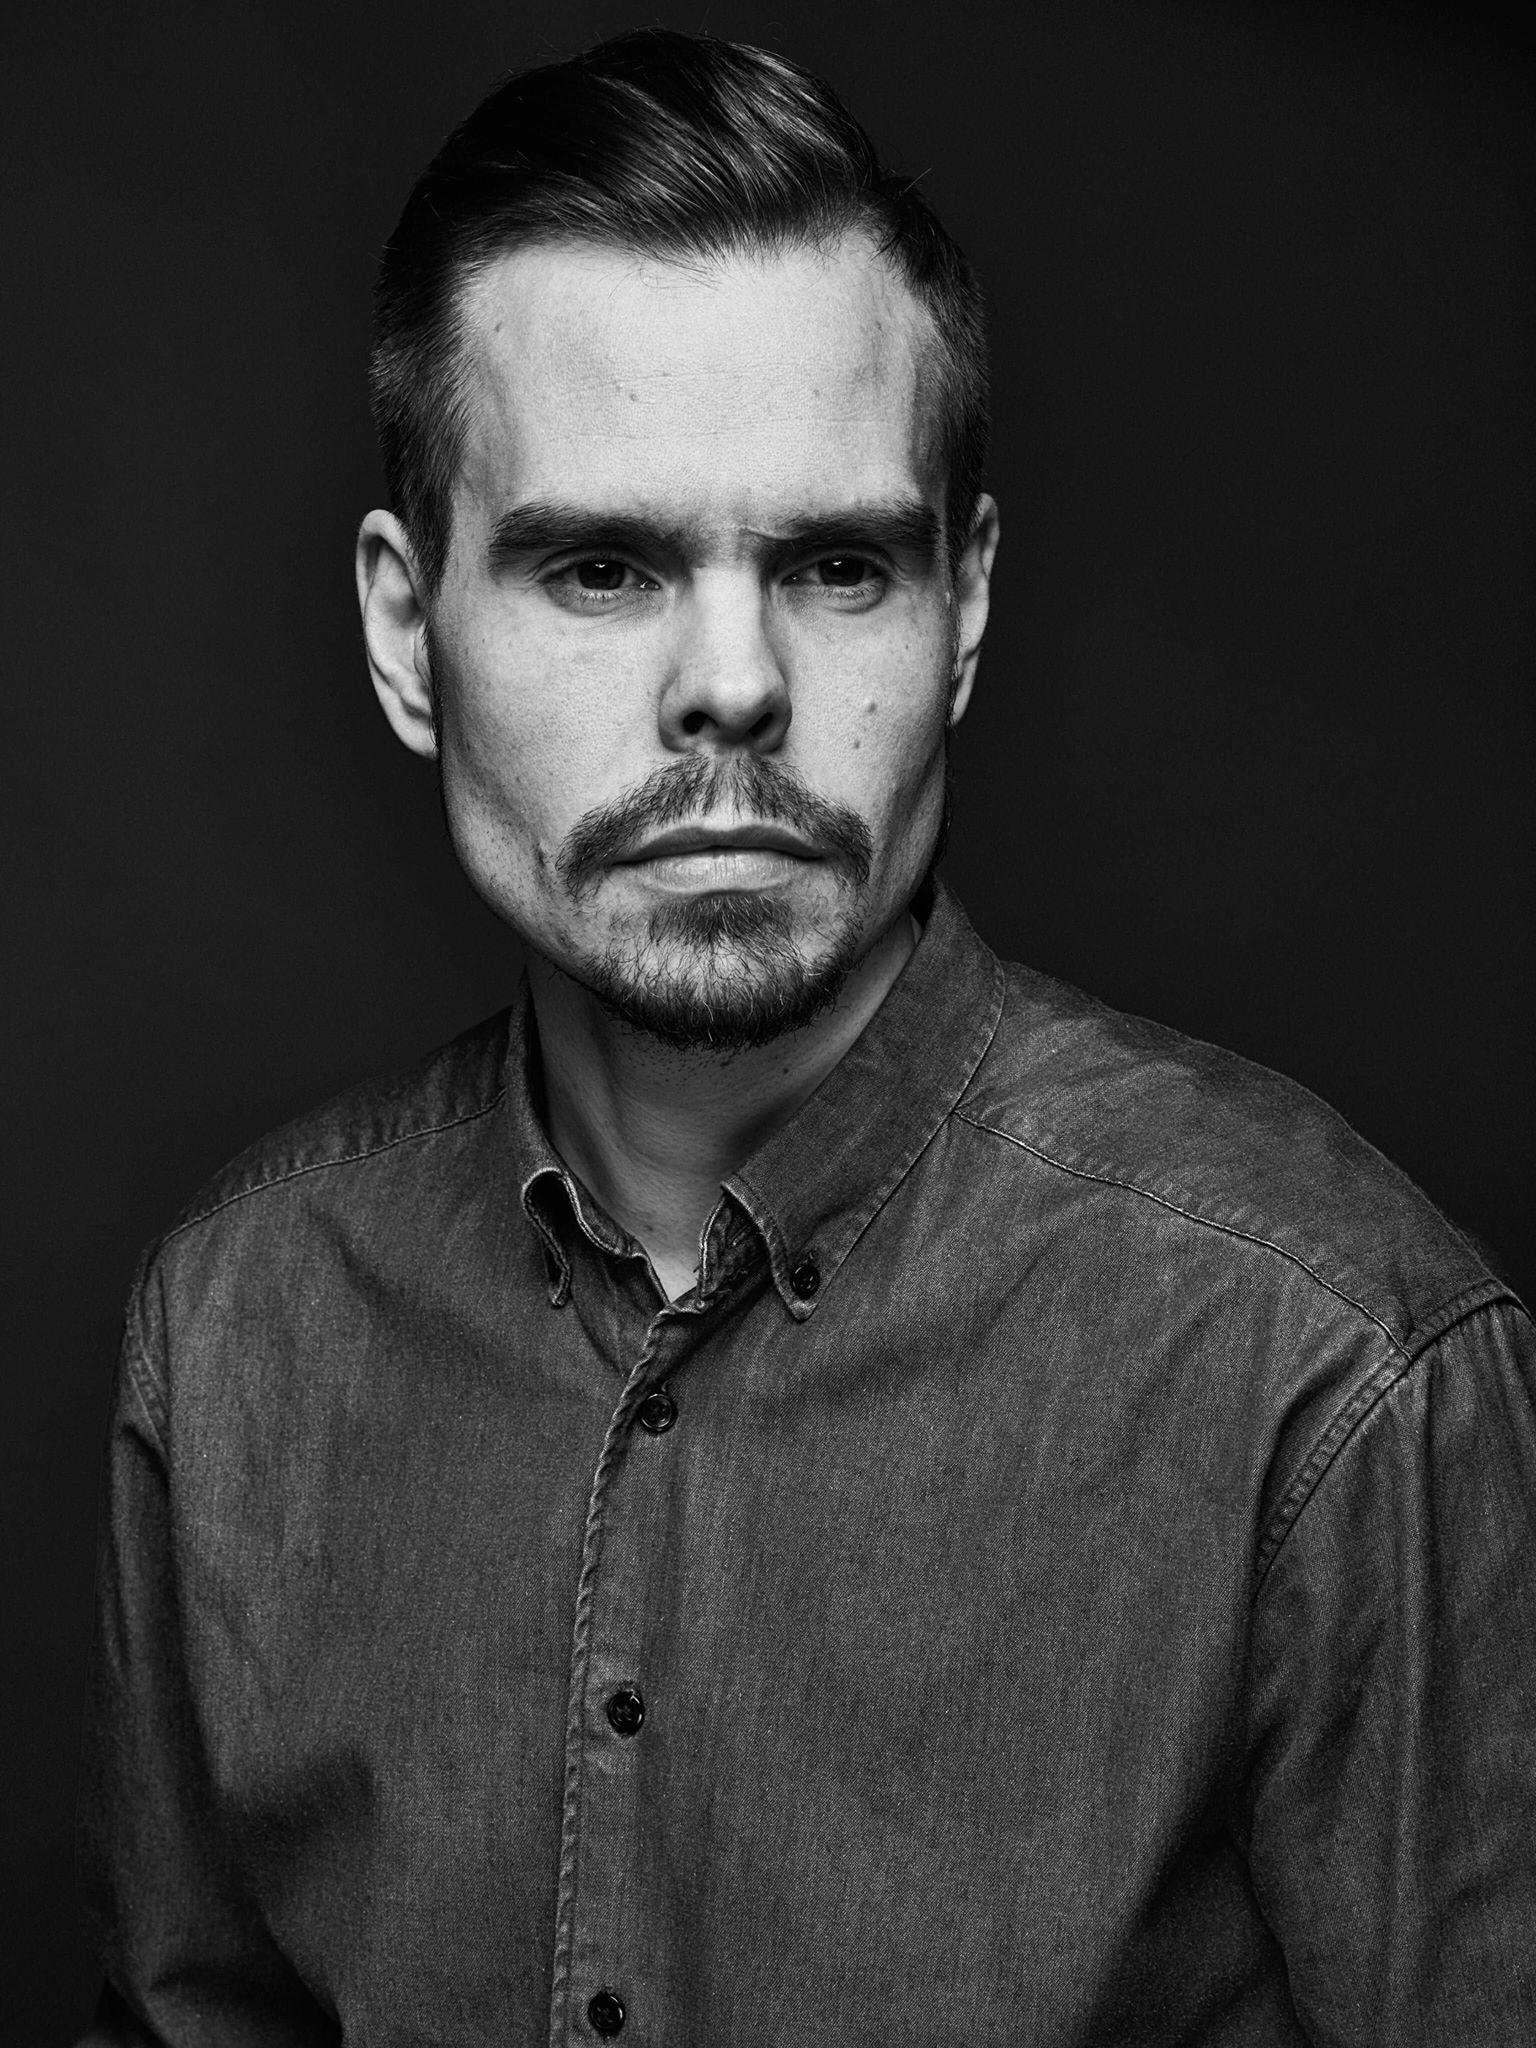 Andreas Varro